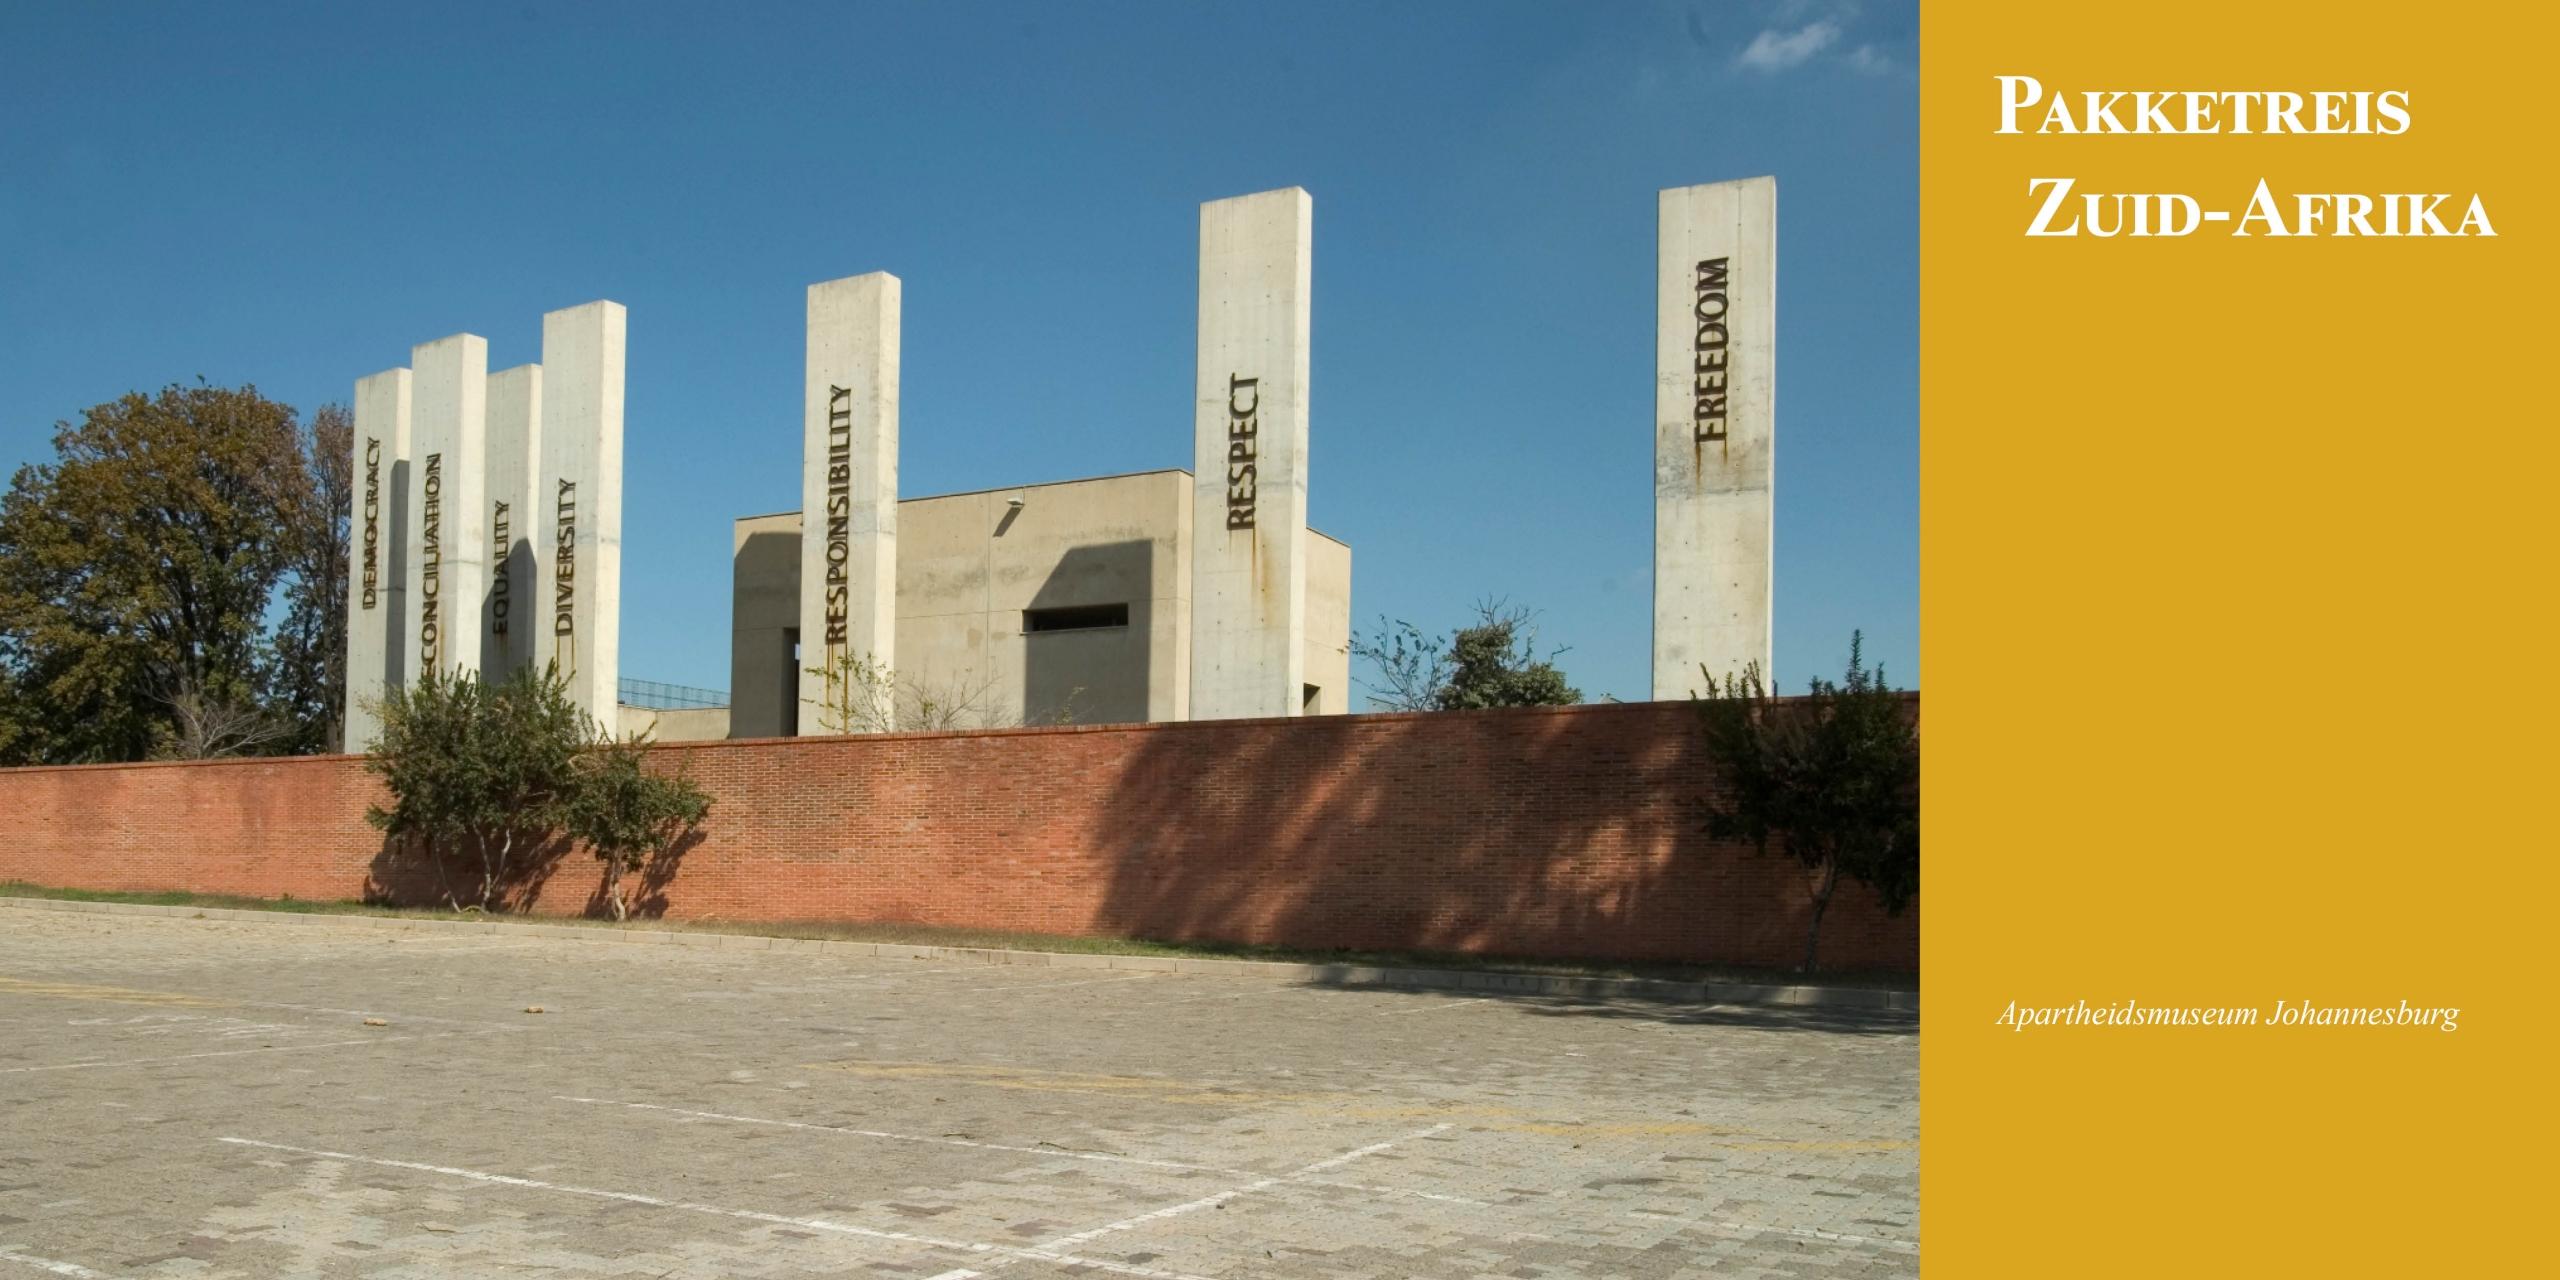 Apartheidsmuseum